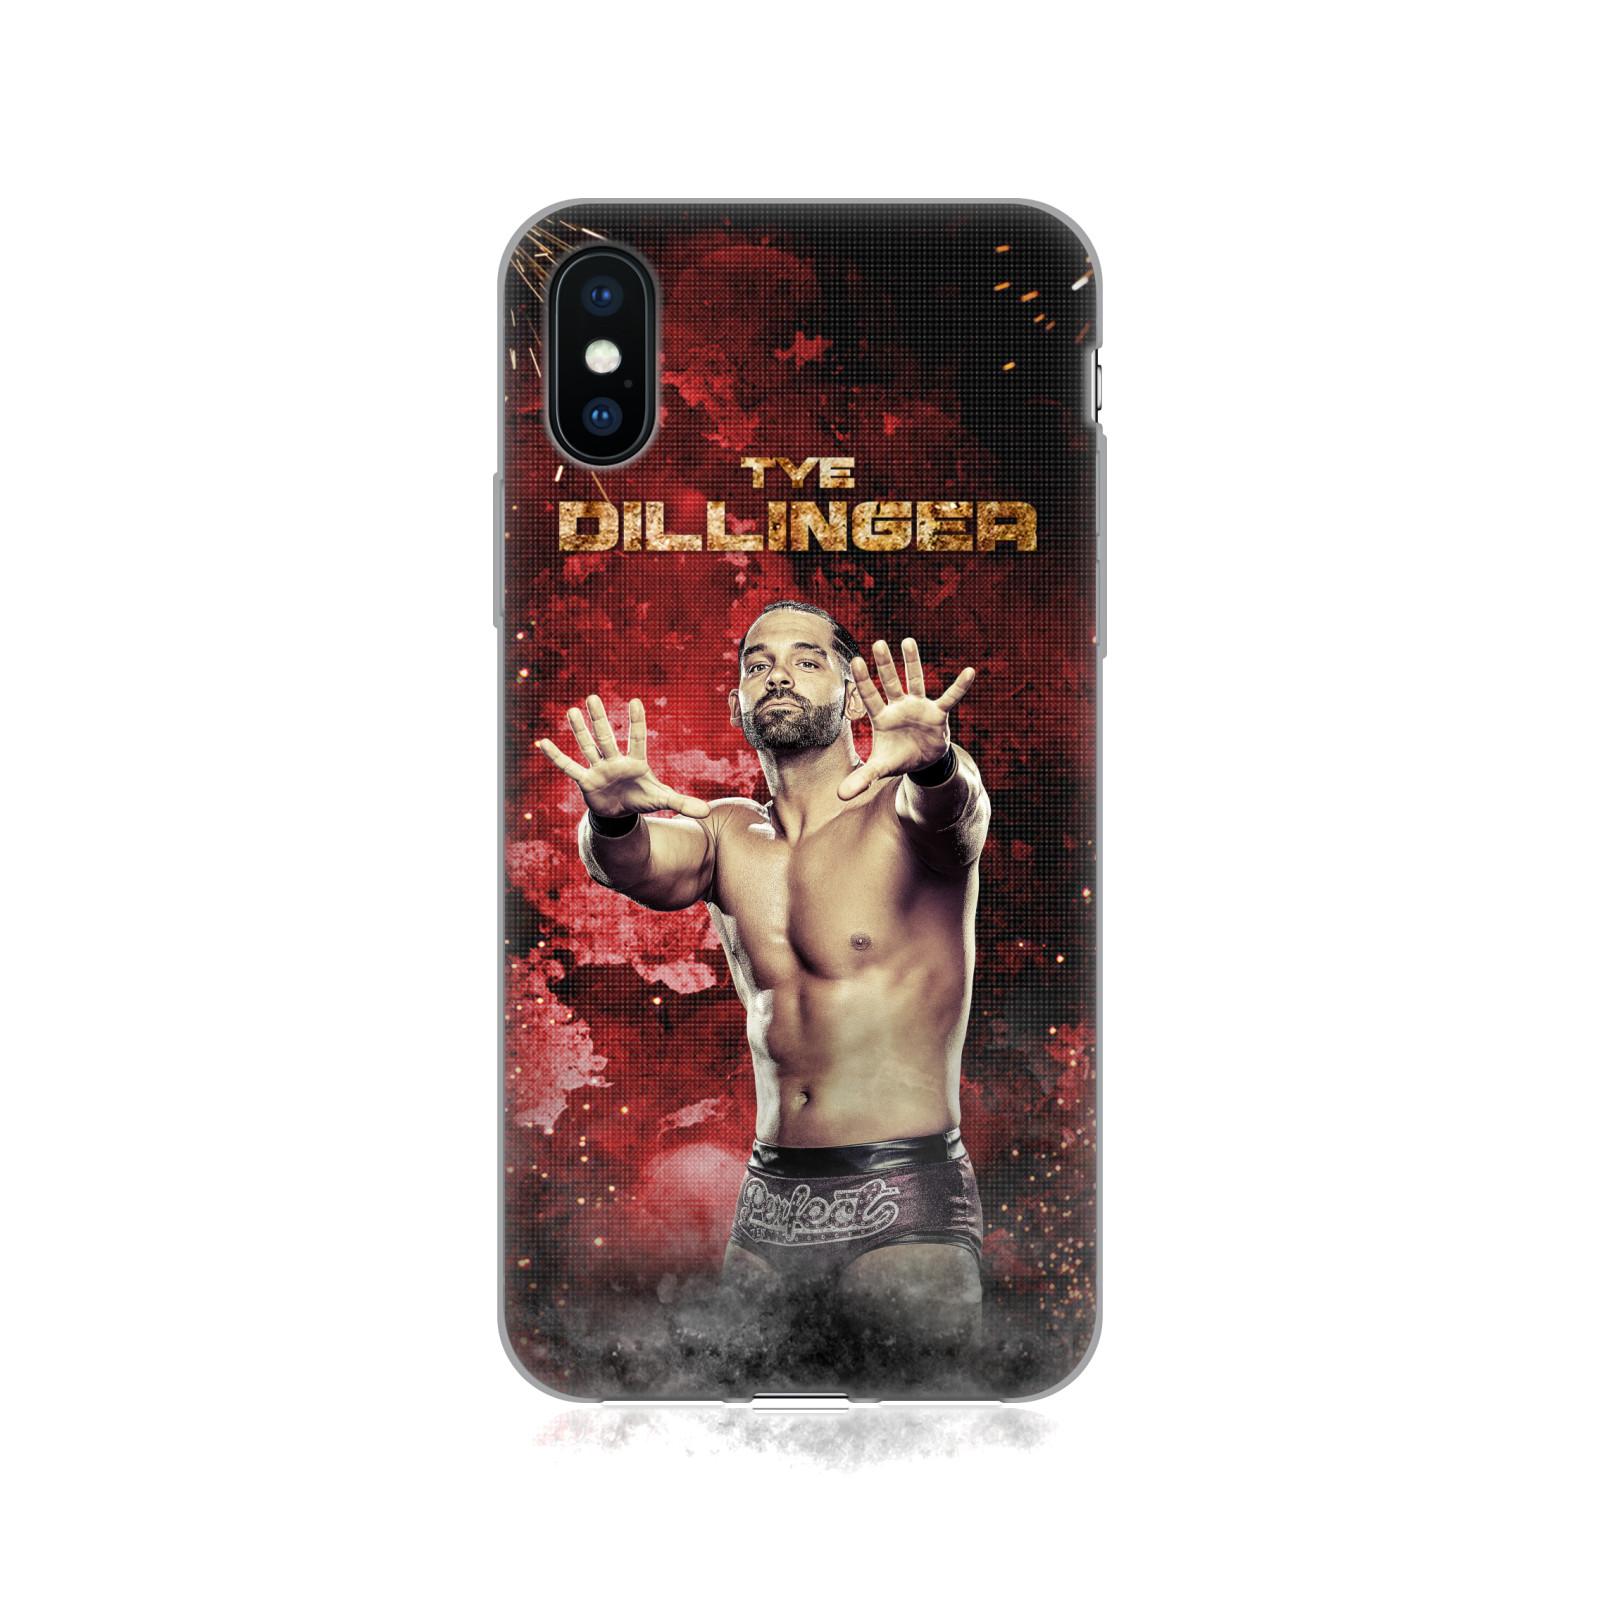 WWE <!--translate-lineup-->Tye Dillinger<!--translate-lineup-->